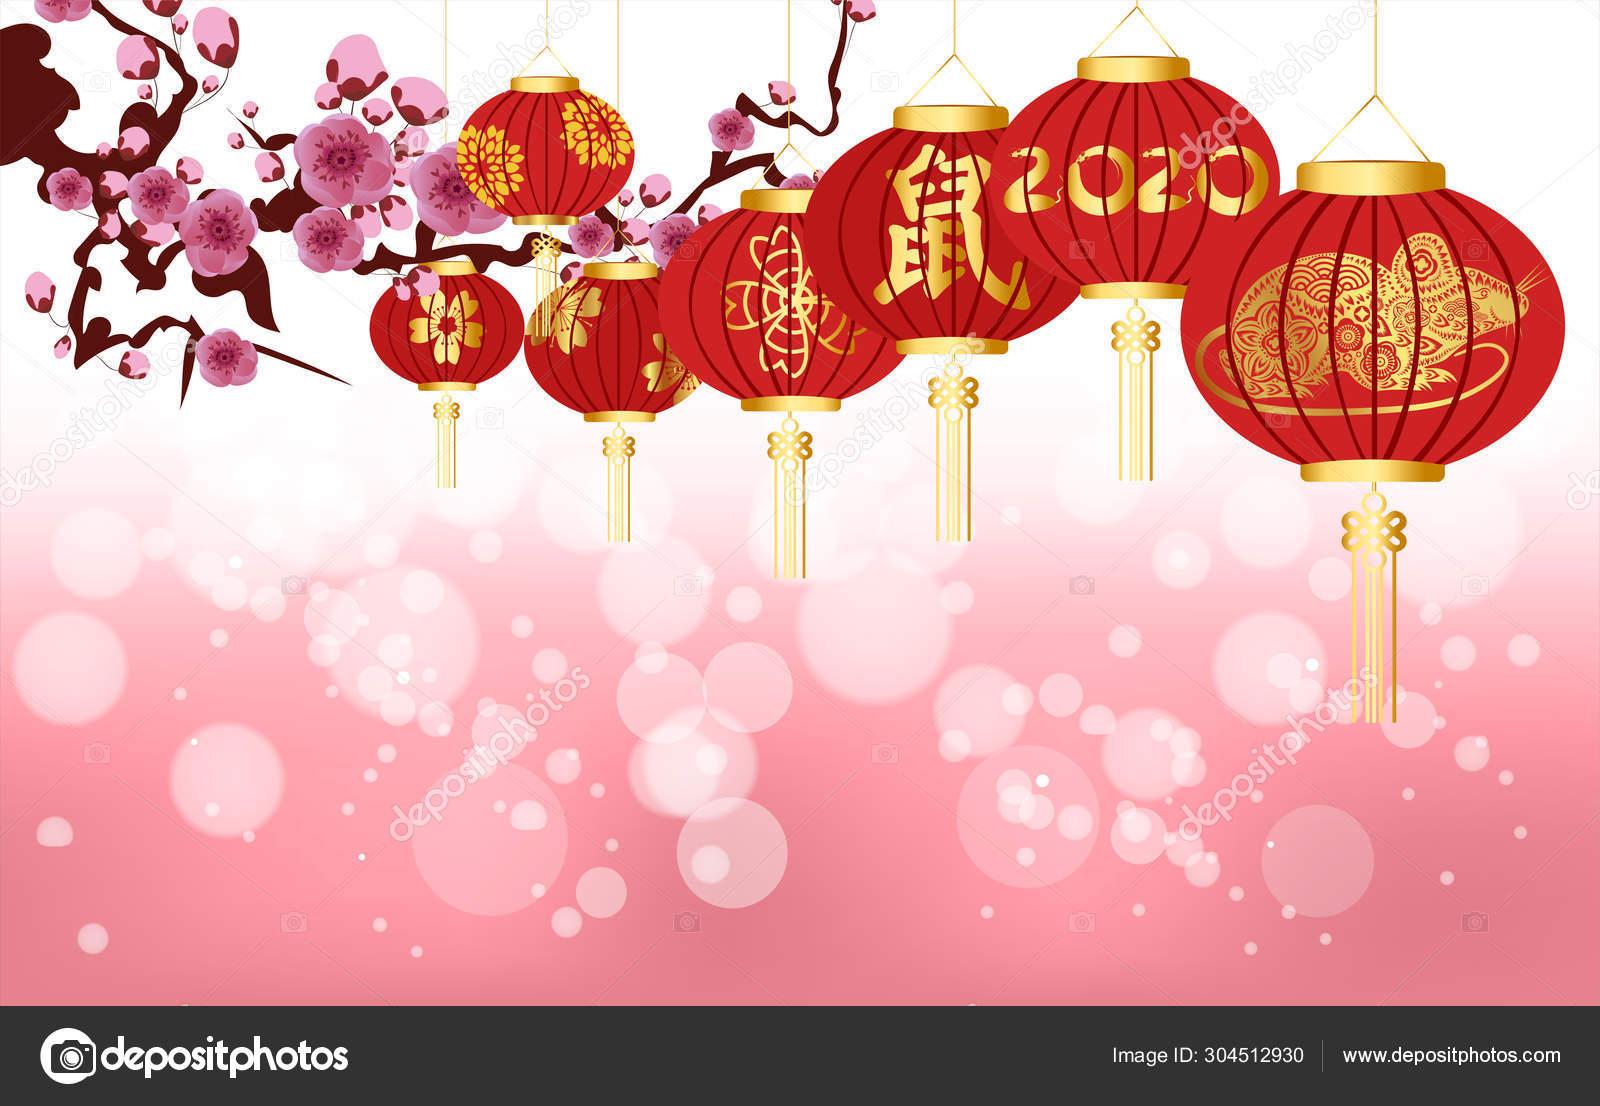 happy chinese new year 2020 background lanterns light effect translation stock vector c ngocdai86 304512930 happy chinese new year 2020 background lanterns light effect translation stock vector c ngocdai86 304512930